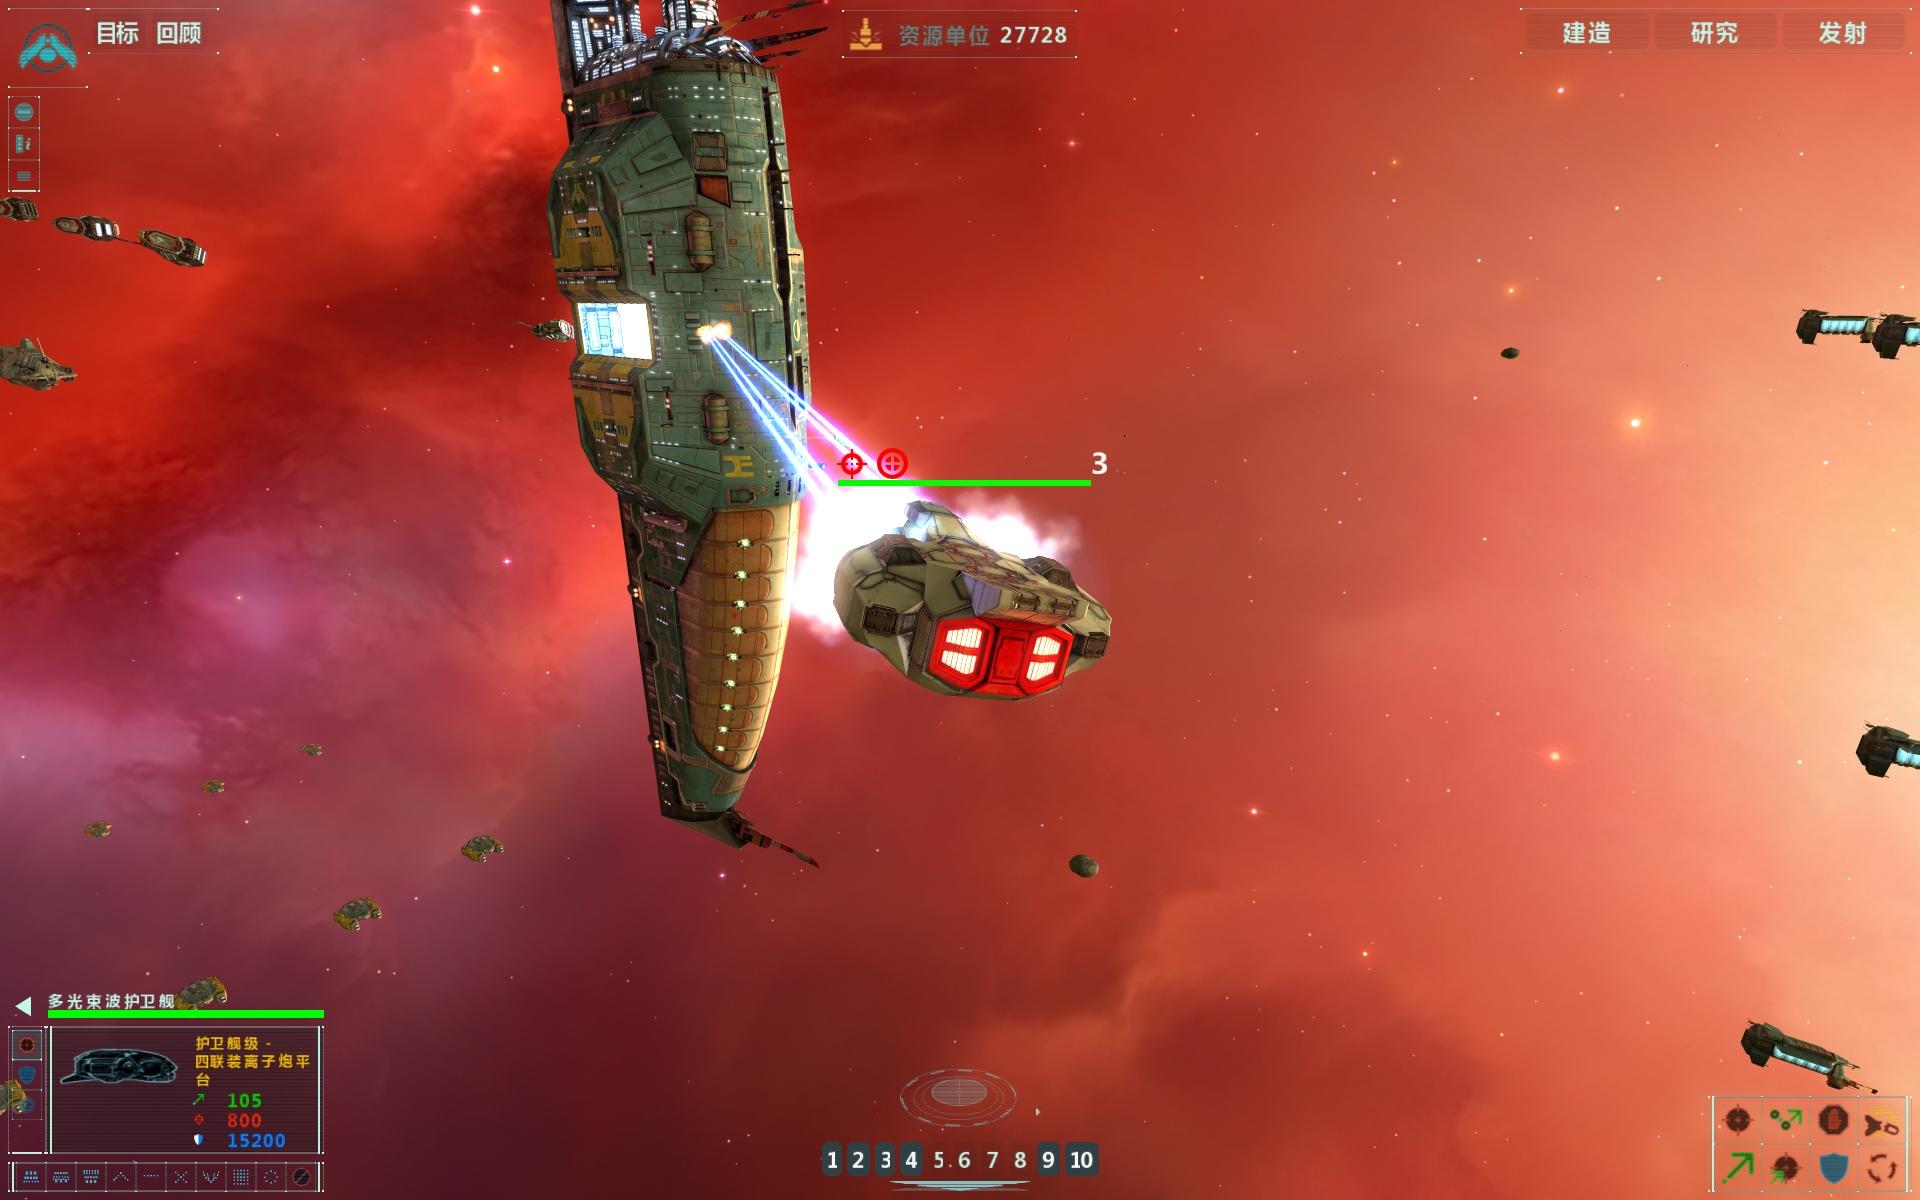 Sanhok Map 0 8 6 Ultra Graphics Gameplay: FX:Galaxy Mod For Homeworld